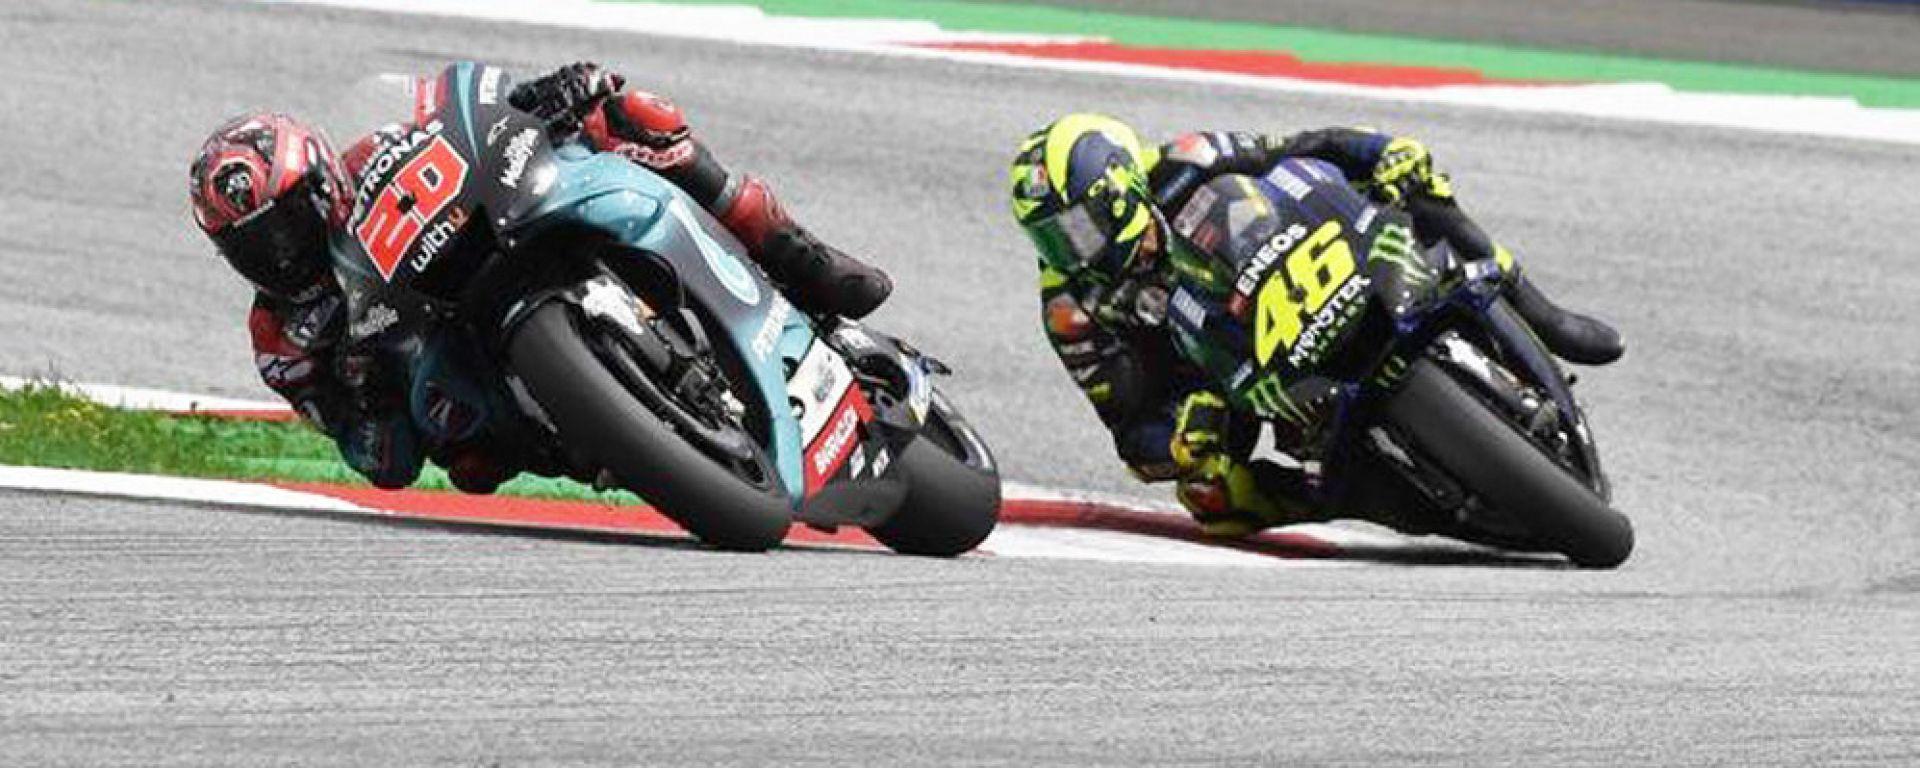 Fabio Quartararo e Valentino Rossi, Yamaha